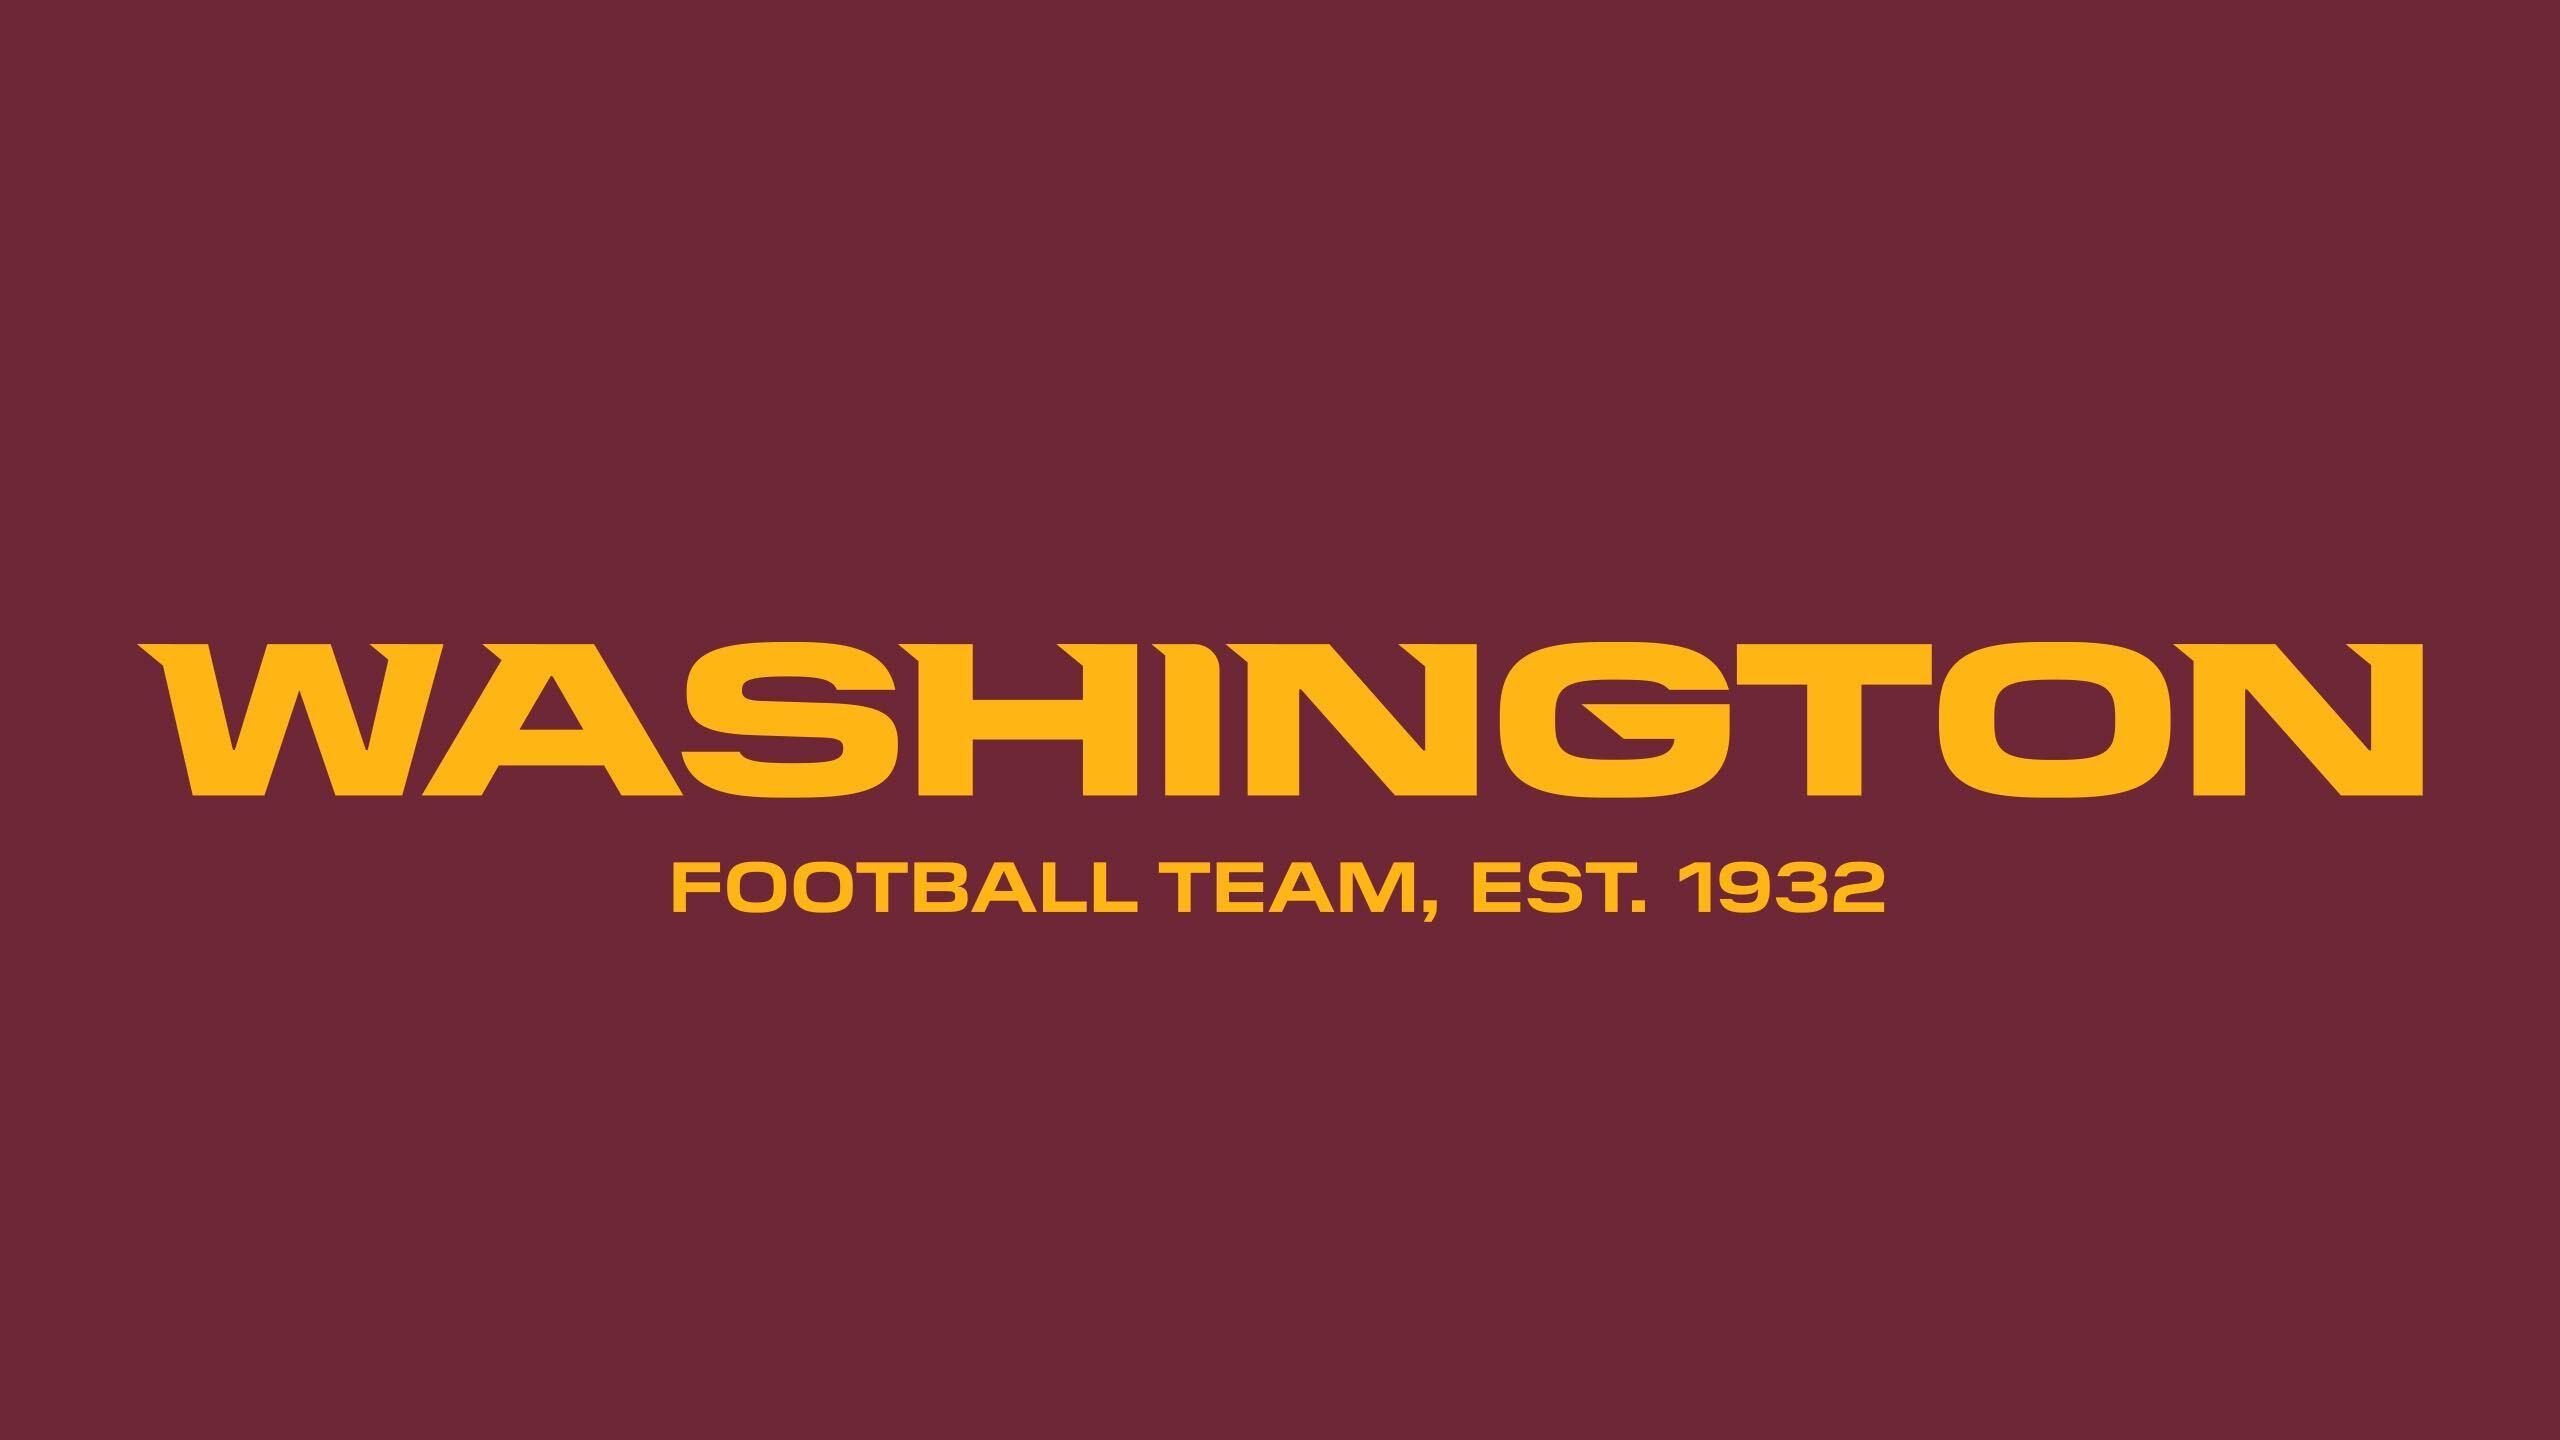 Washington Football Team Franchise To Go By Interim Name This Season The Washington Post